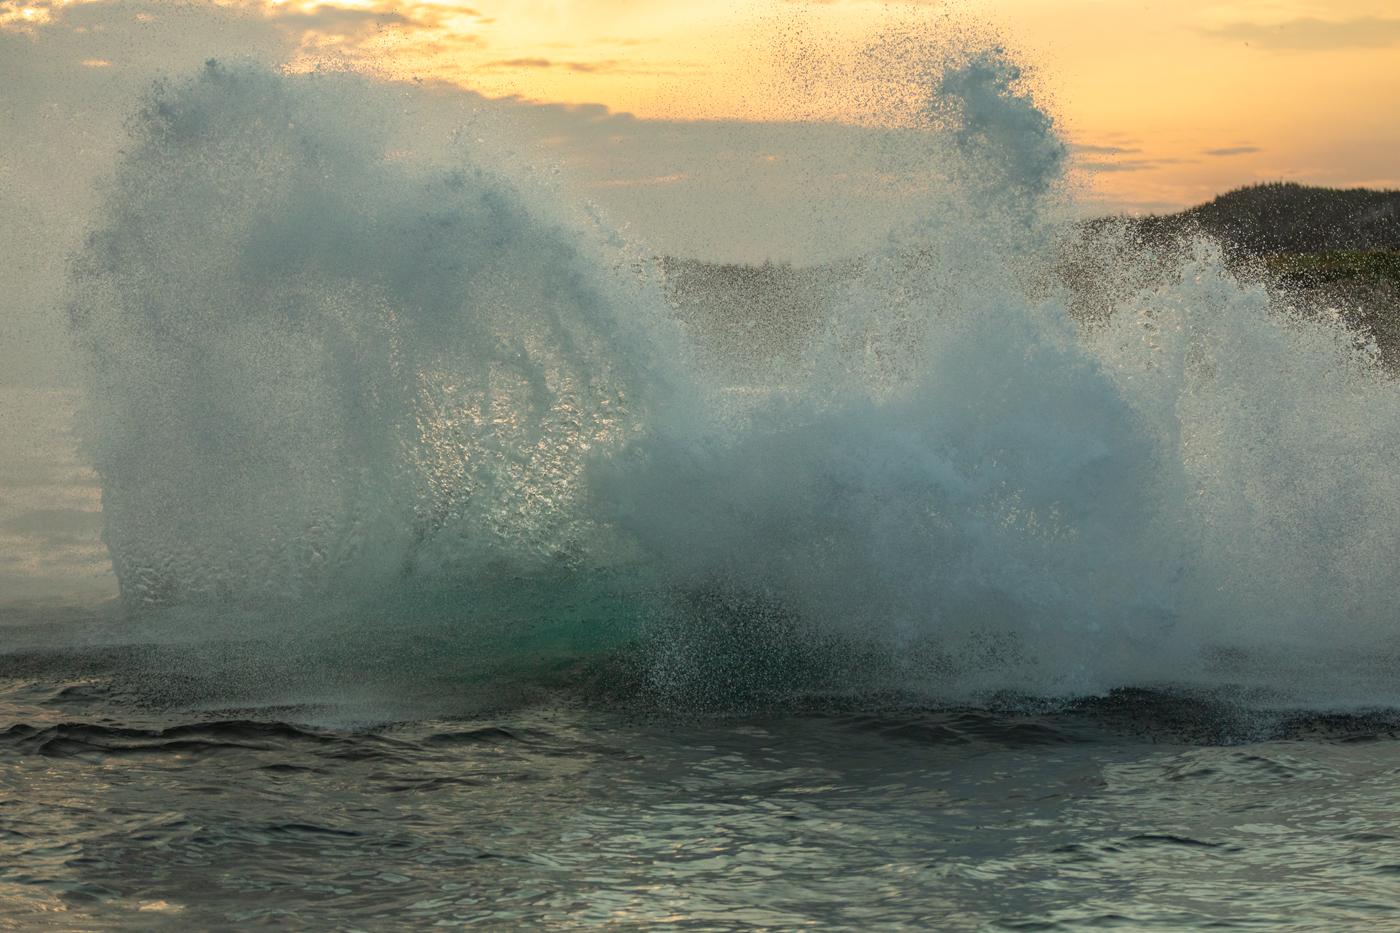 Humpback-Whale-Breach-Five.jpg